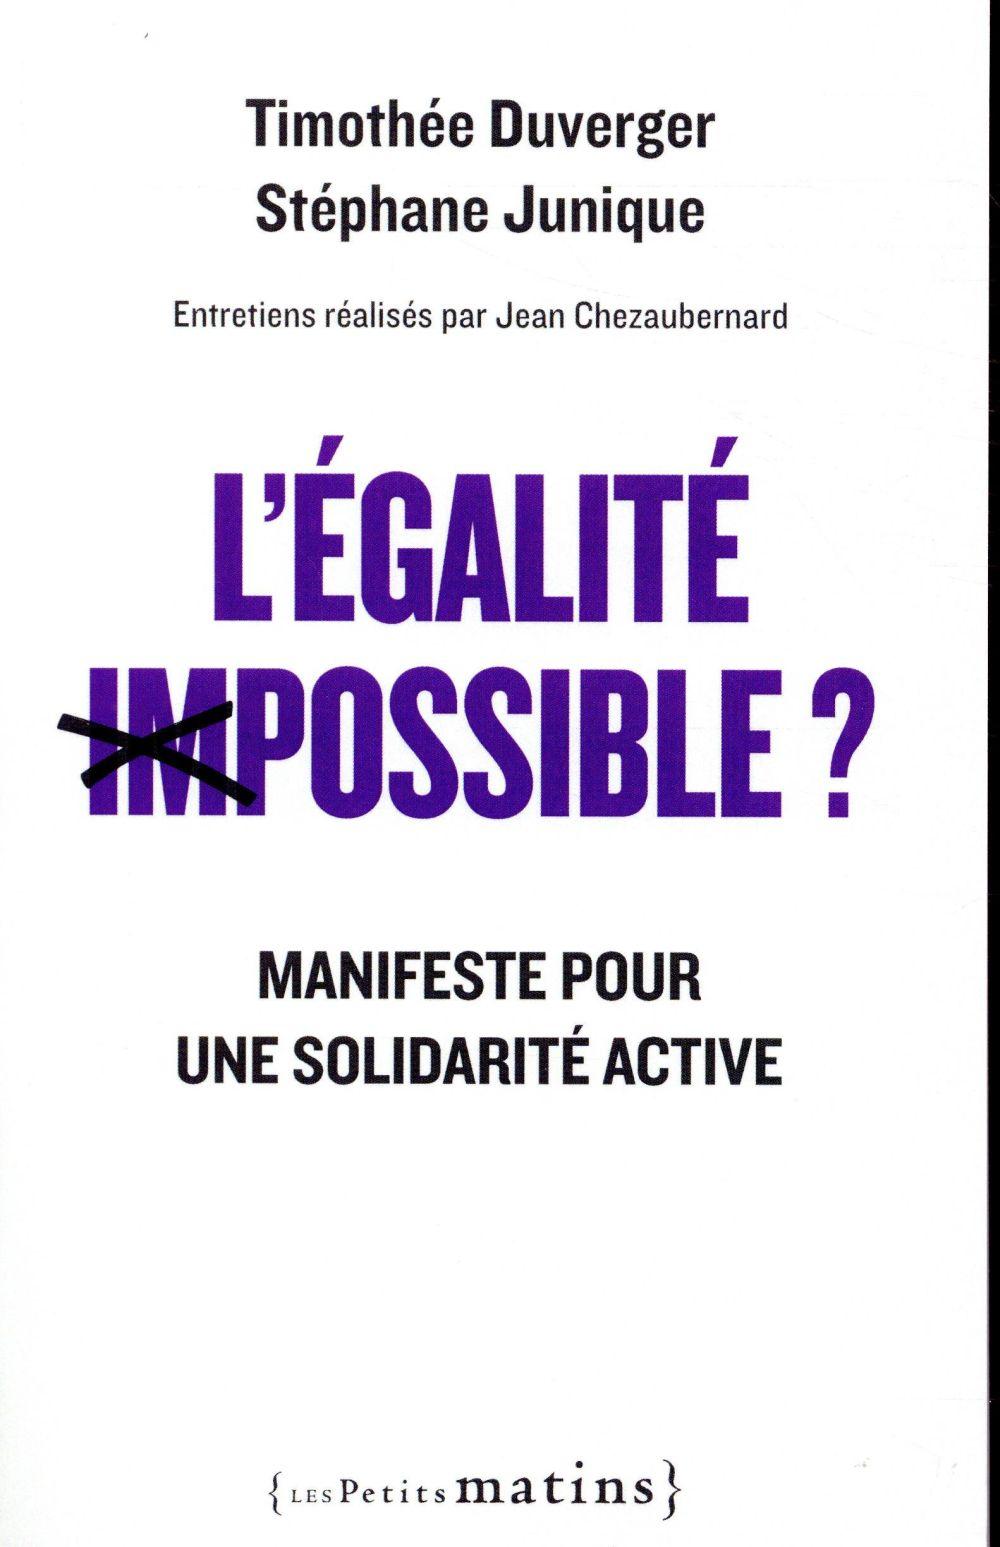 L'EGALITE IMPOSSIBLE ? - MANIFESTE POUR UNE SOLIDARITE ACTIVE